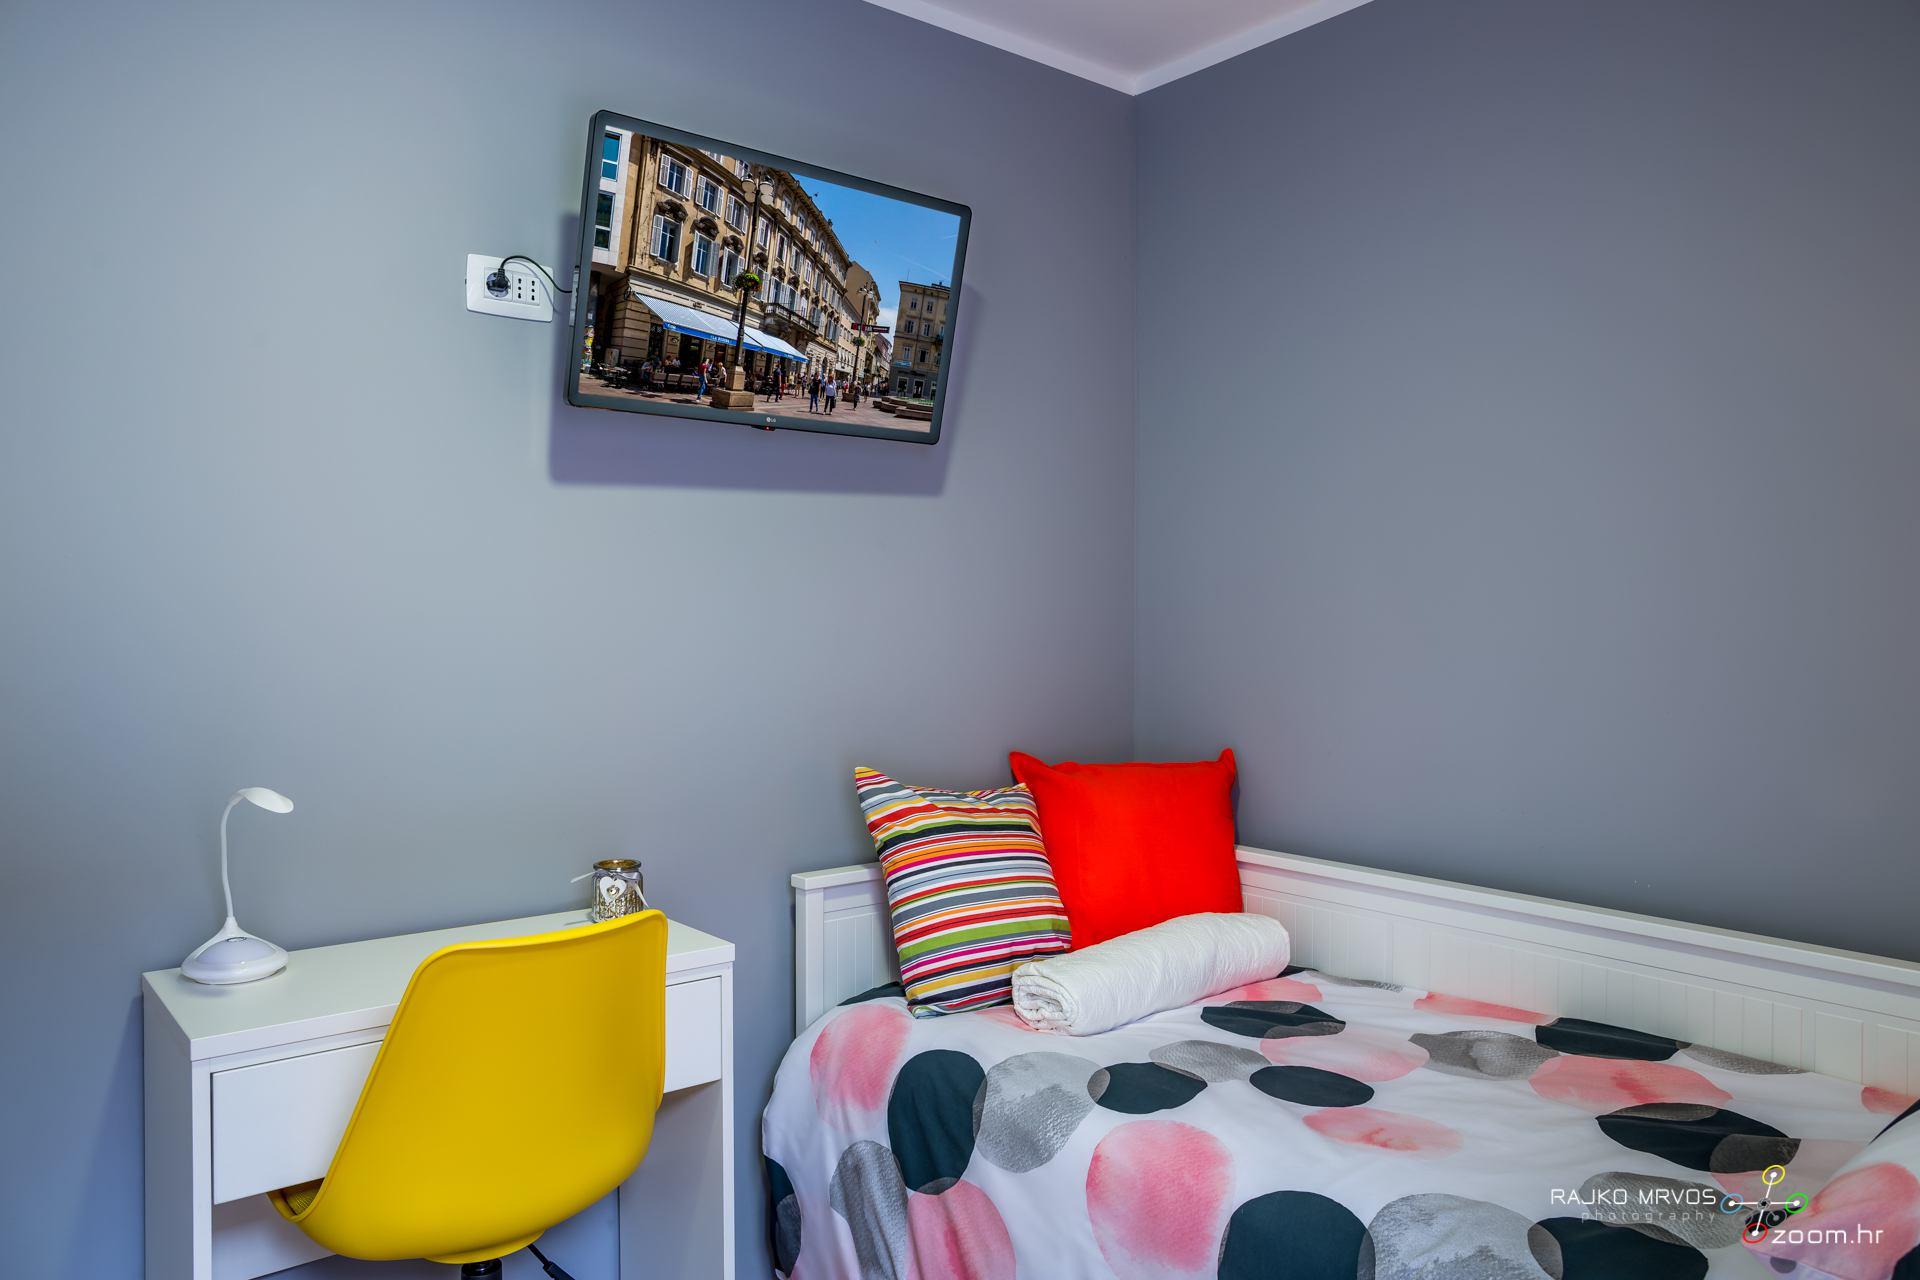 profesionalno-fotografiranje-interijera-fotograf-apartmana-apartman-Elena-Rijeka-27